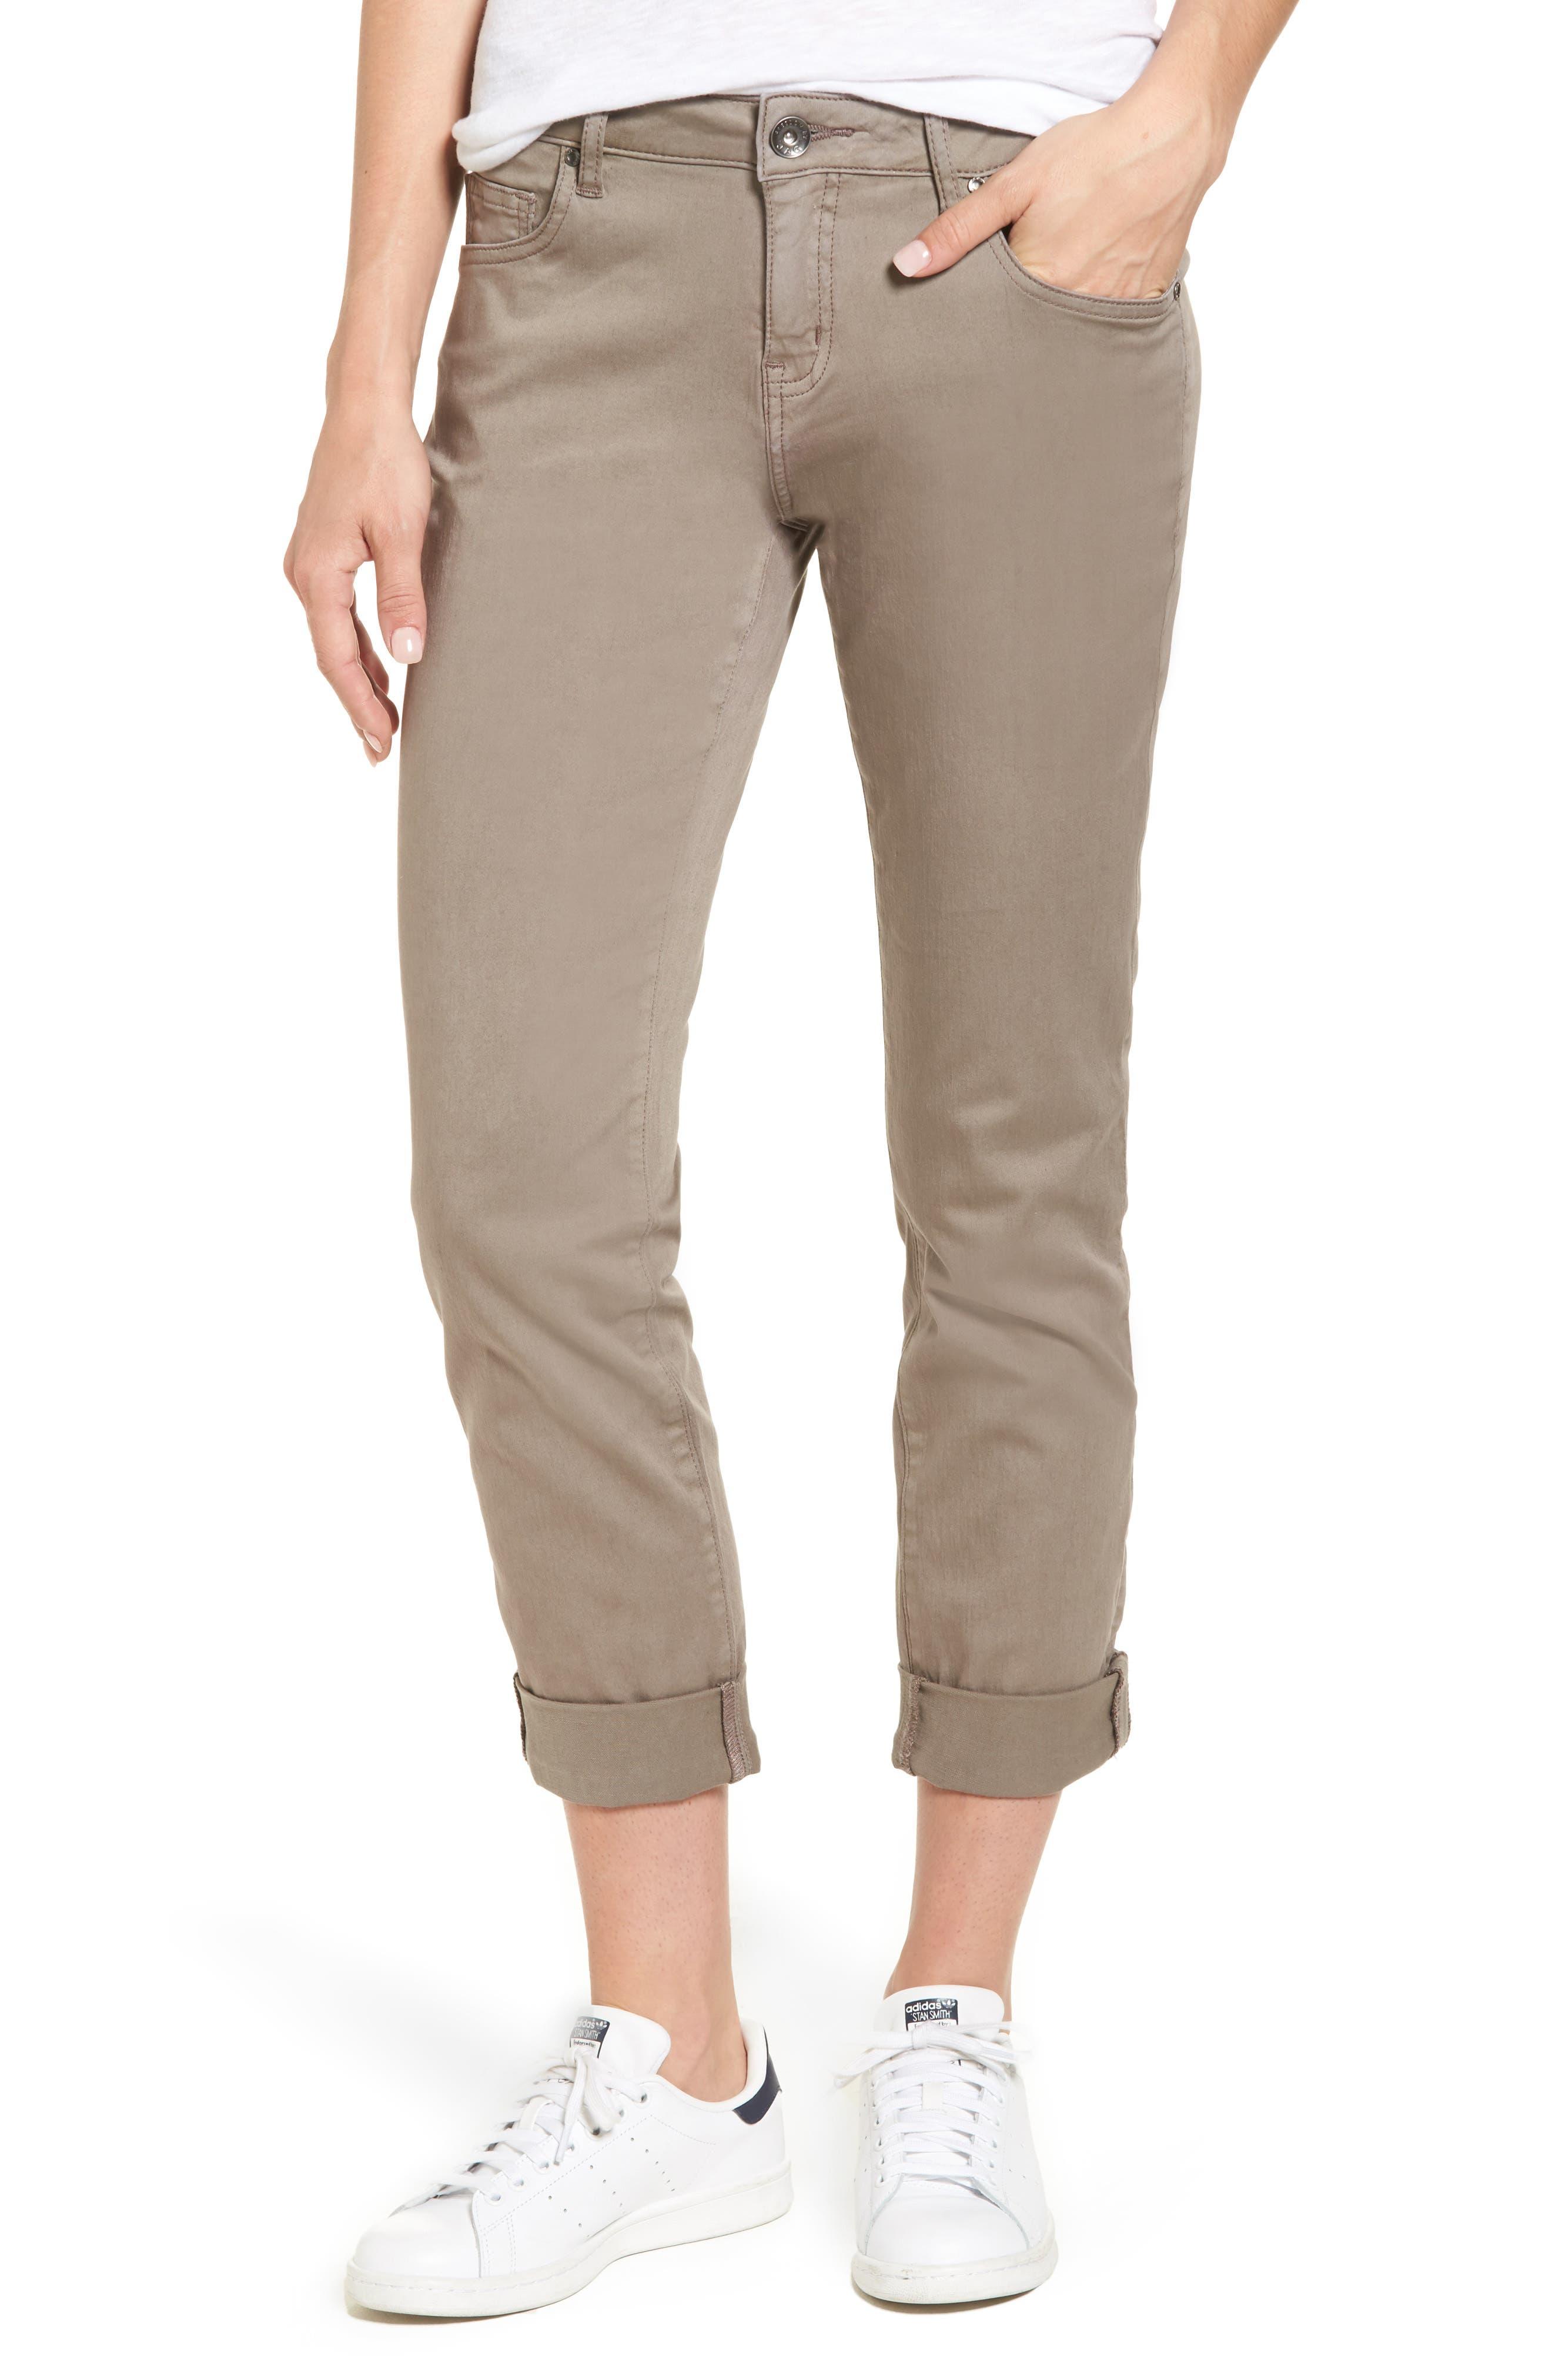 Jag Jeans Carter Knit Denim Girlfriend Jeans (Gull)